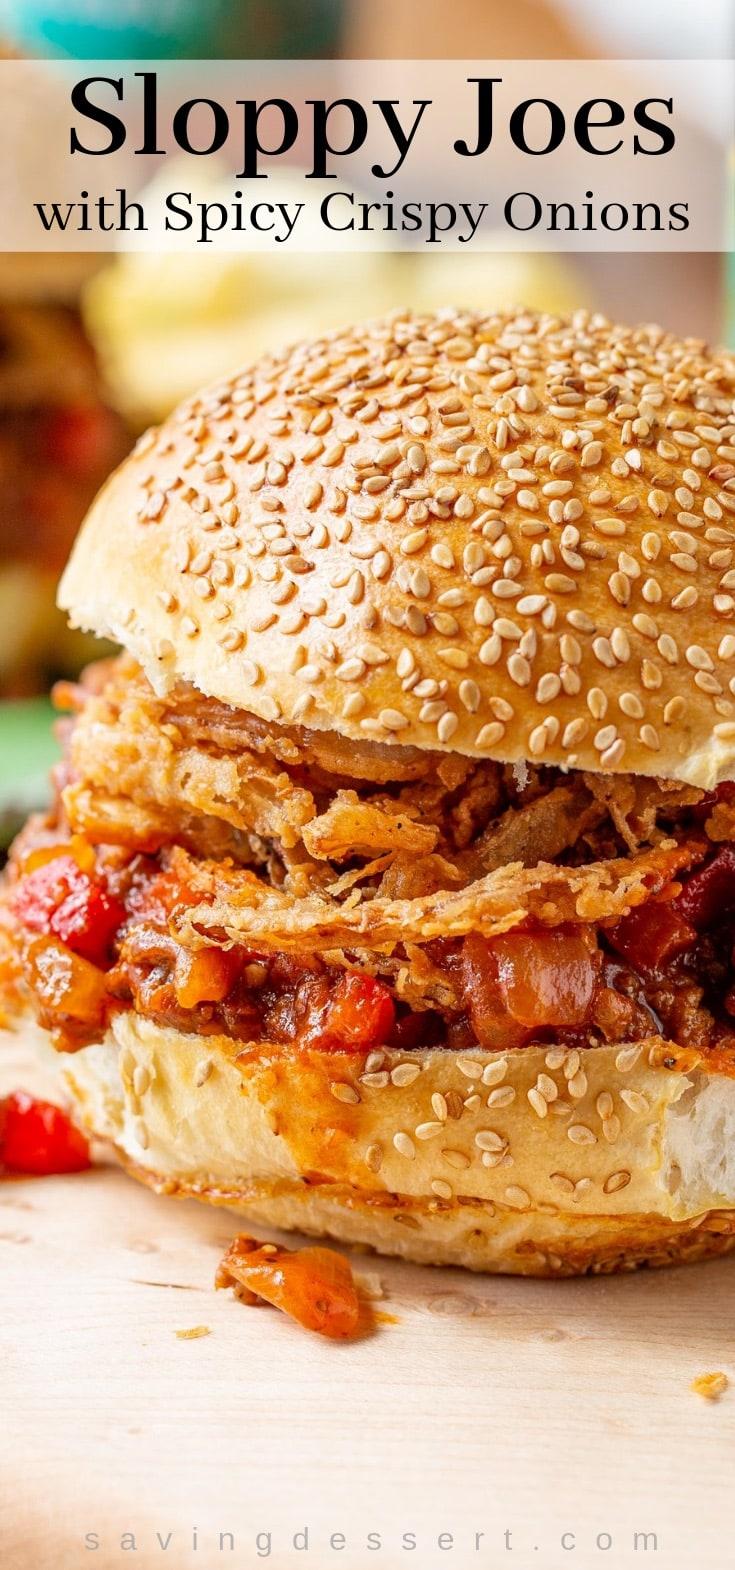 A sloppy joe sandwich with crispy onions and a toasted sesame seed bun